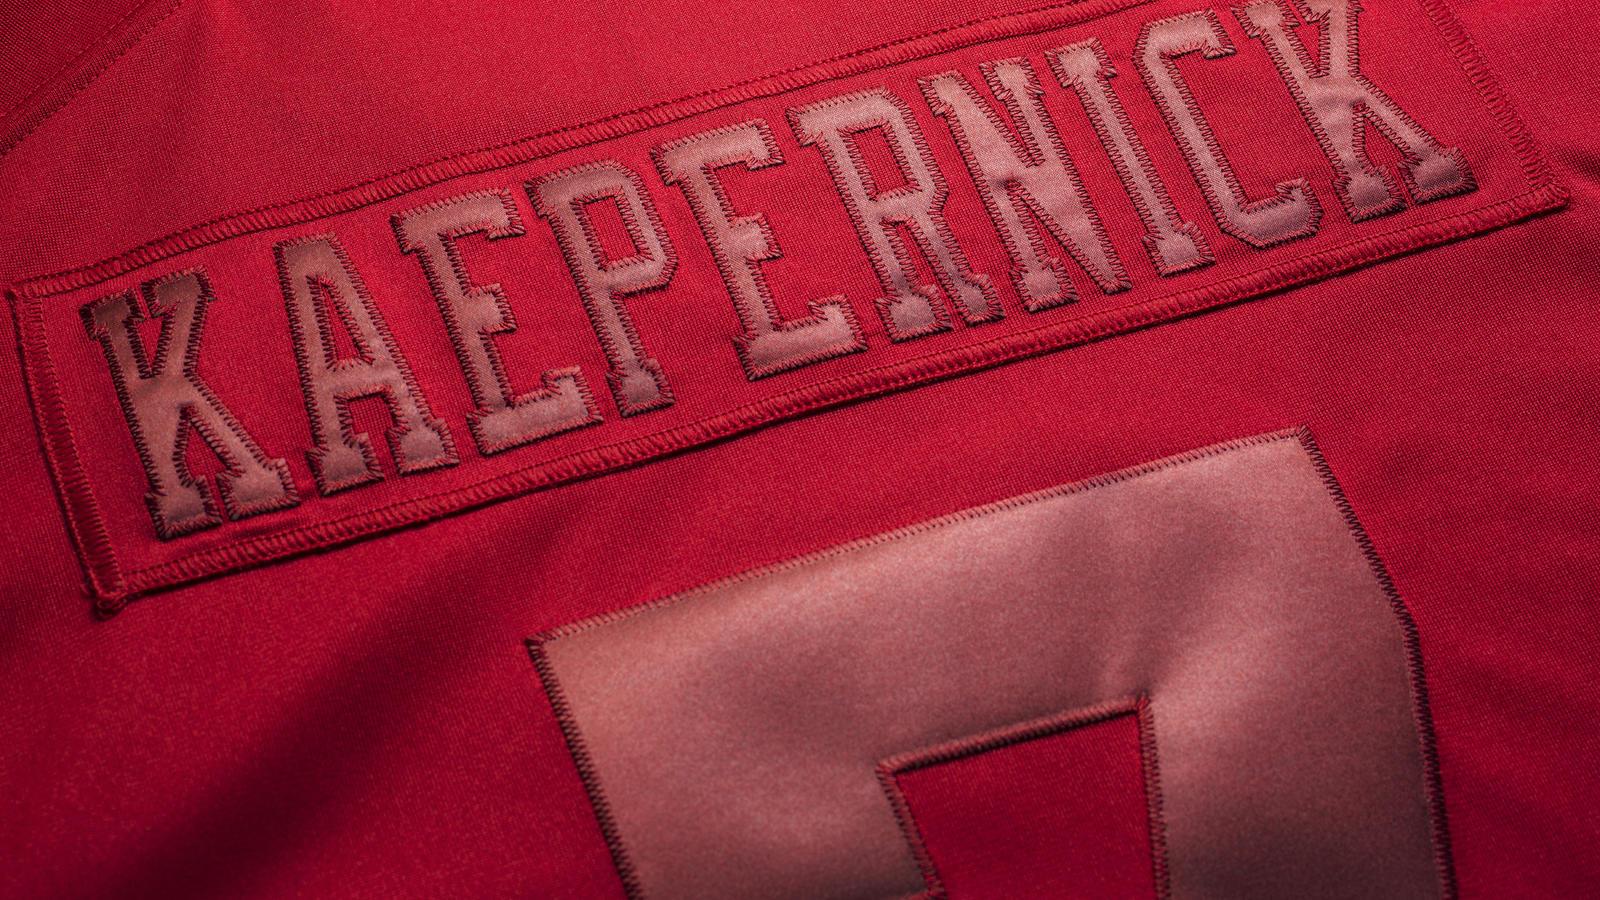 fa13_at_drenchpack_49ers_details_006_lr